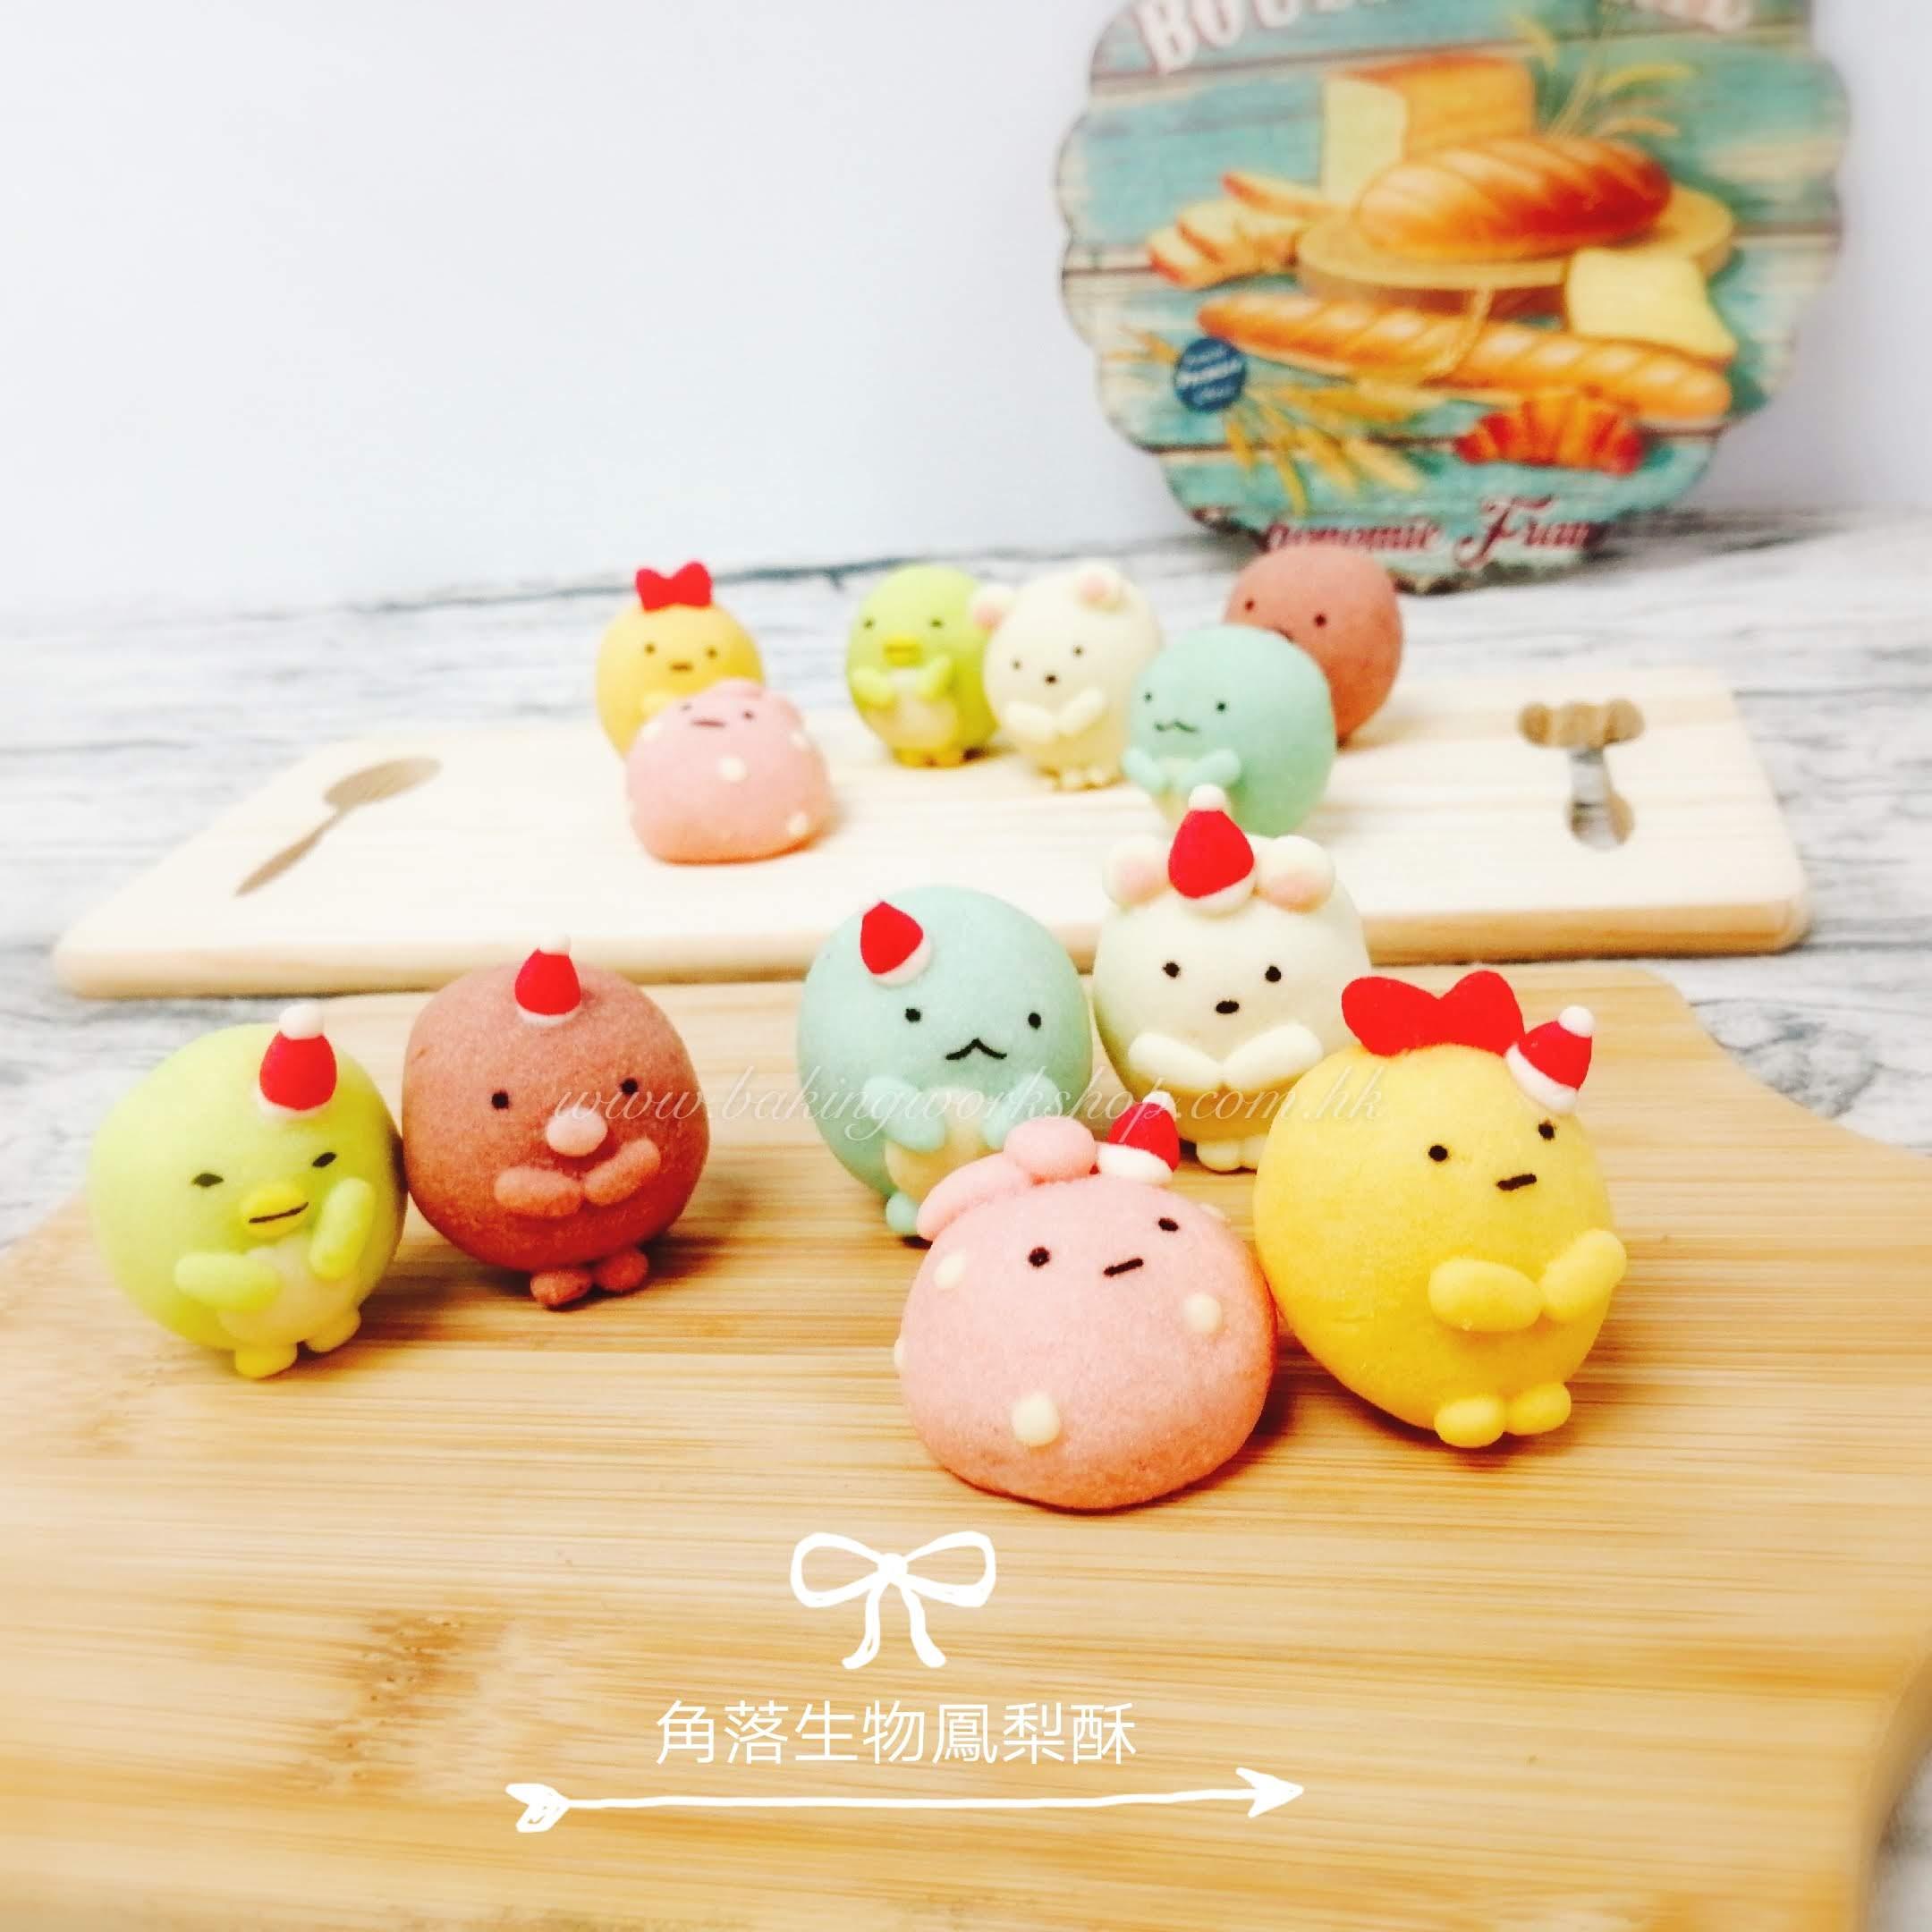 角落生物鳳梨酥 (Christmas Version)